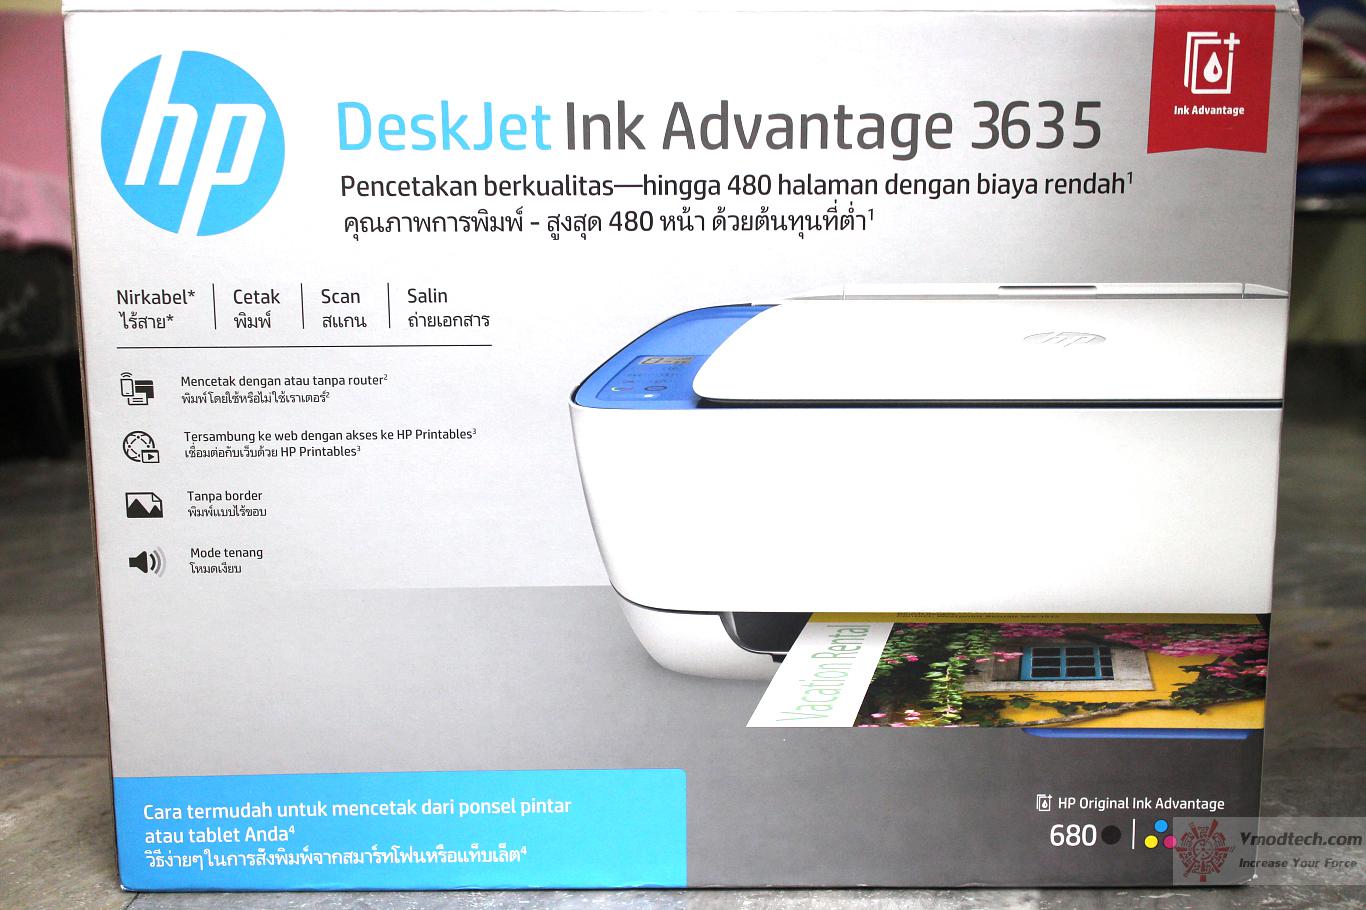 img 6881 HP Deskjet Ink Advantage 3635